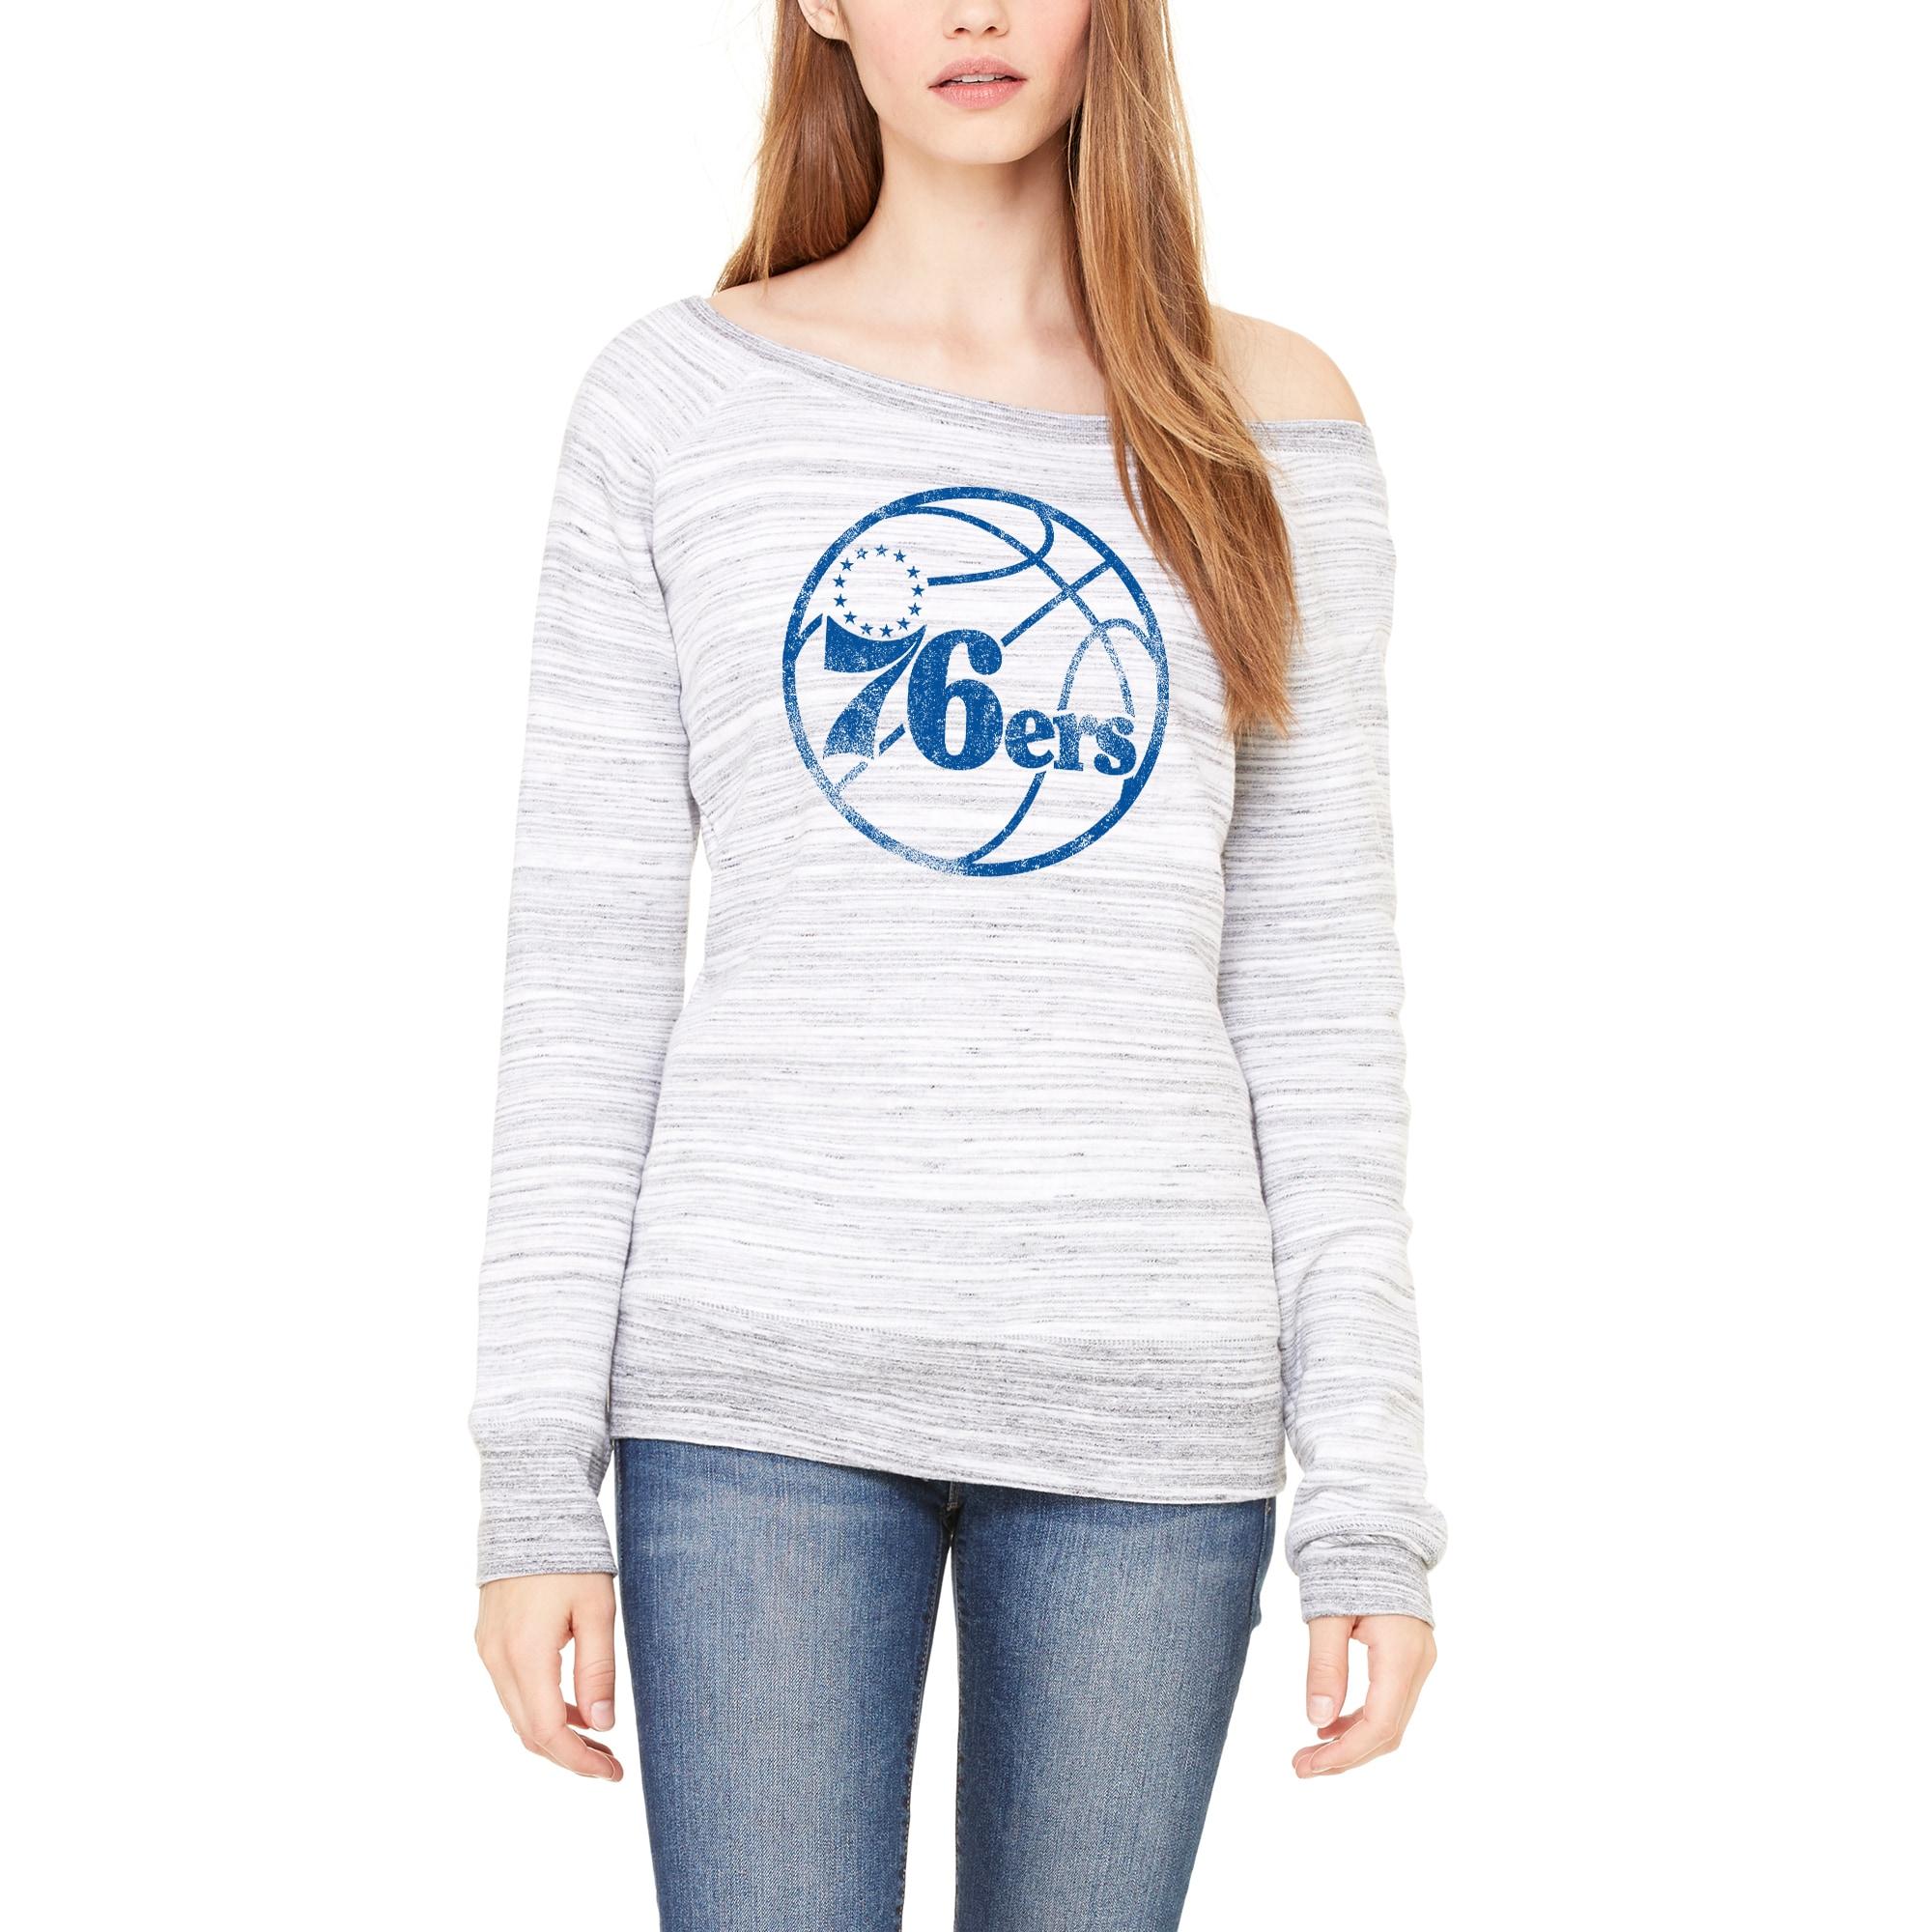 Philadelphia 76ers Let Loose by RNL Women's Game Day Wide Neck Sweatshirt - Ash